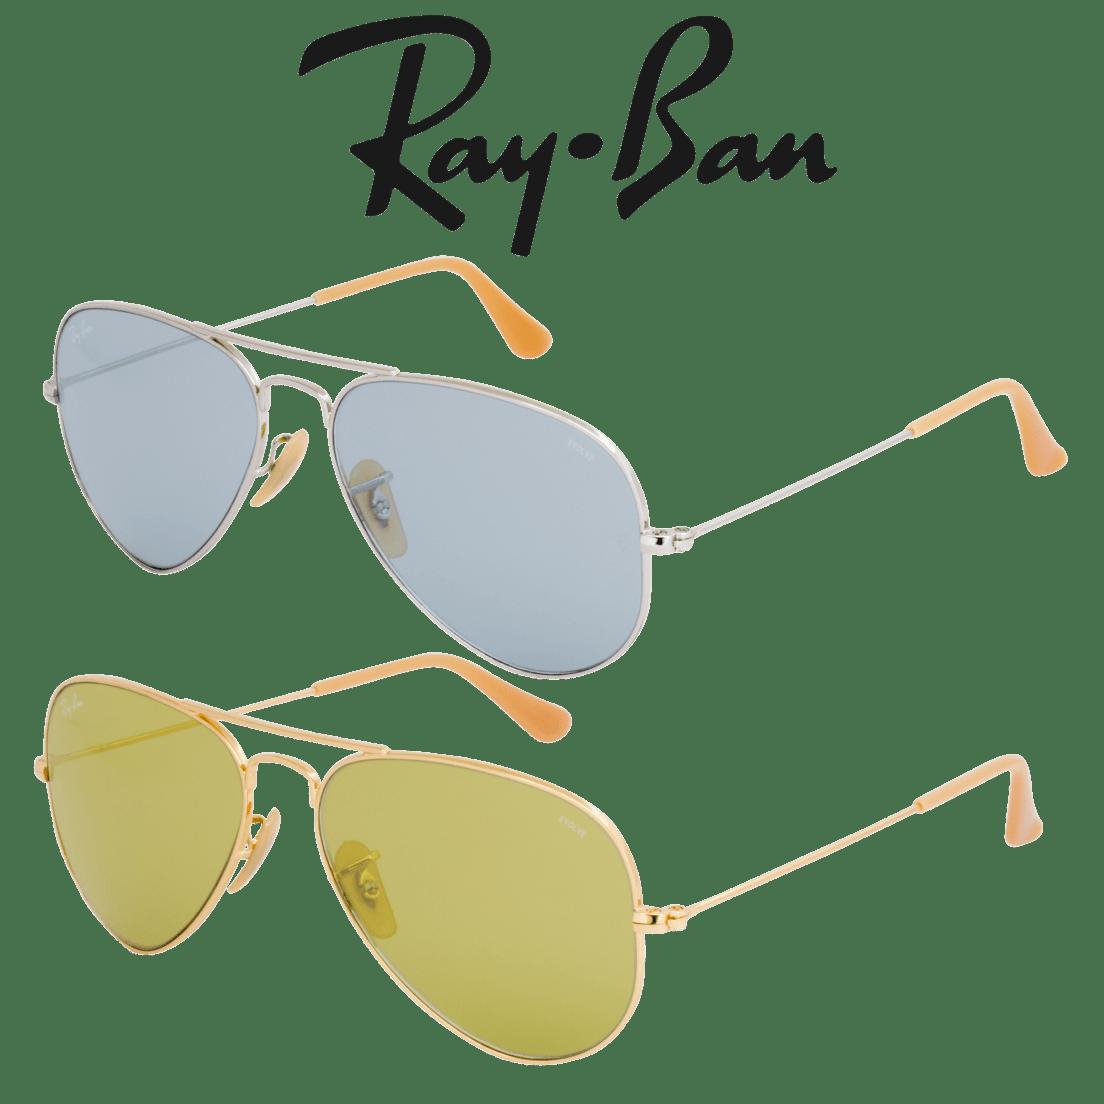 ff97031b54768 Ray-Ban RB3025 Aviator Evolve Sunglasses